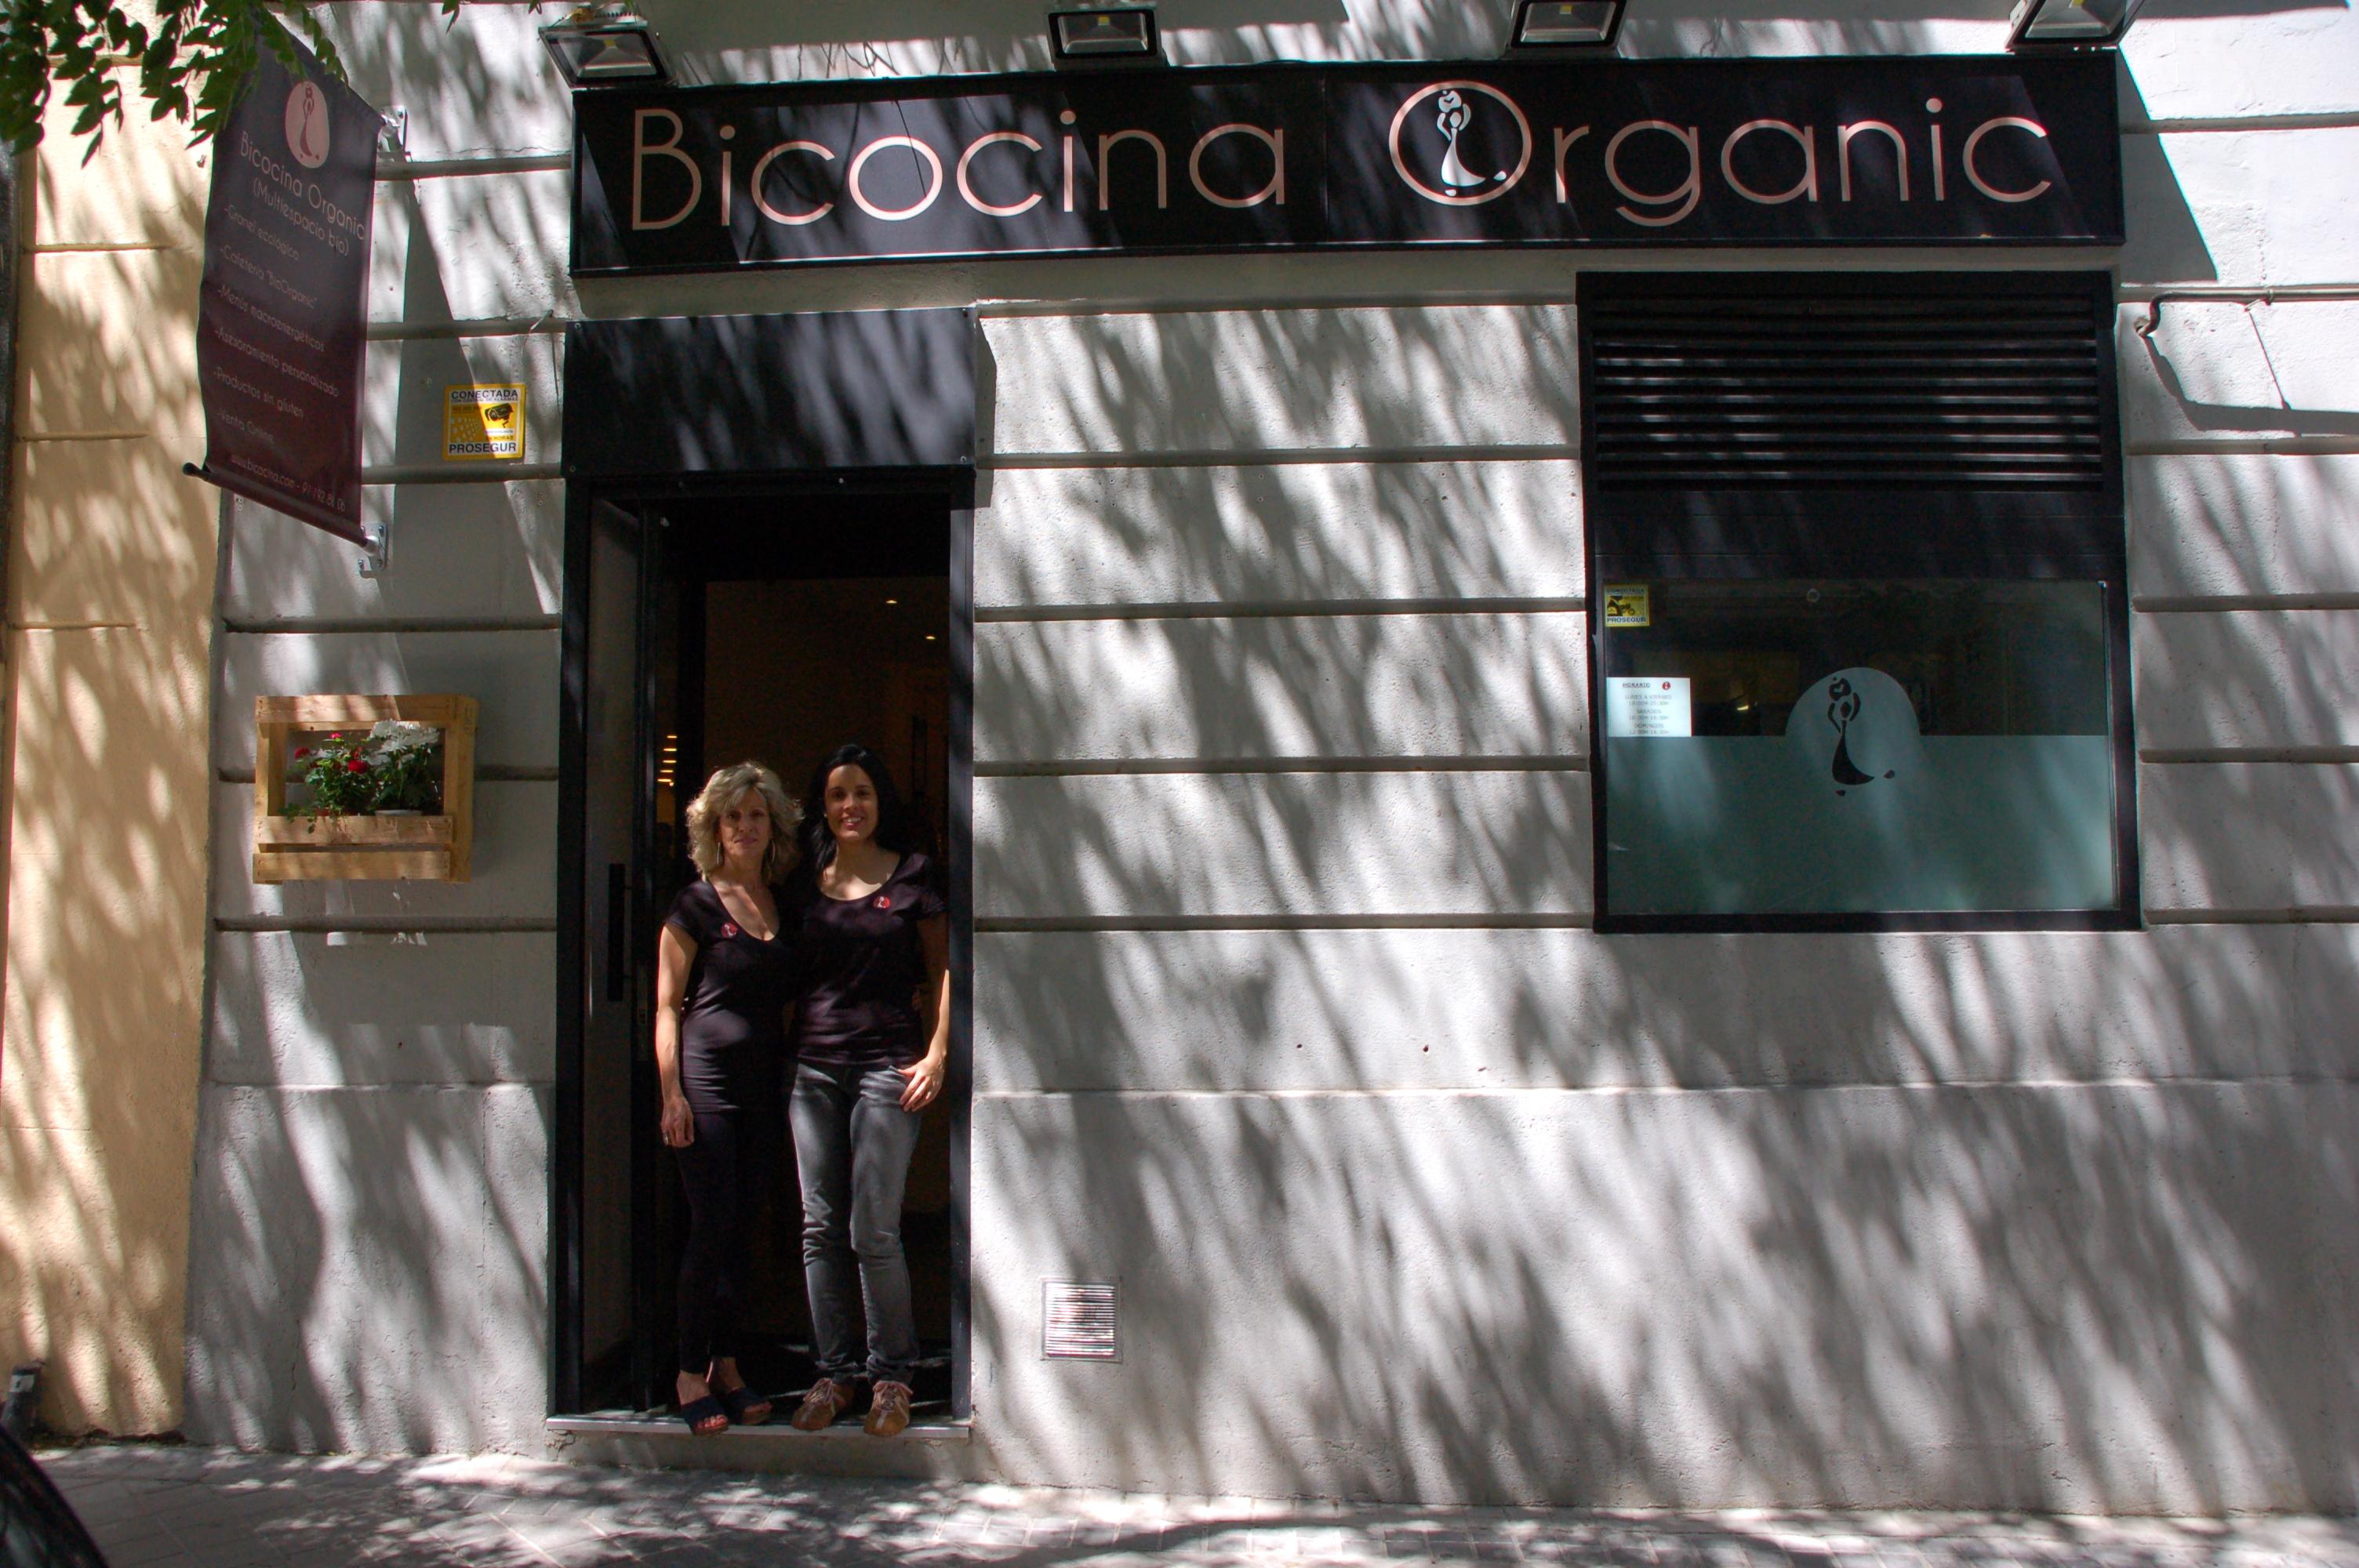 bicocina organica distribuidor de filtros de agua